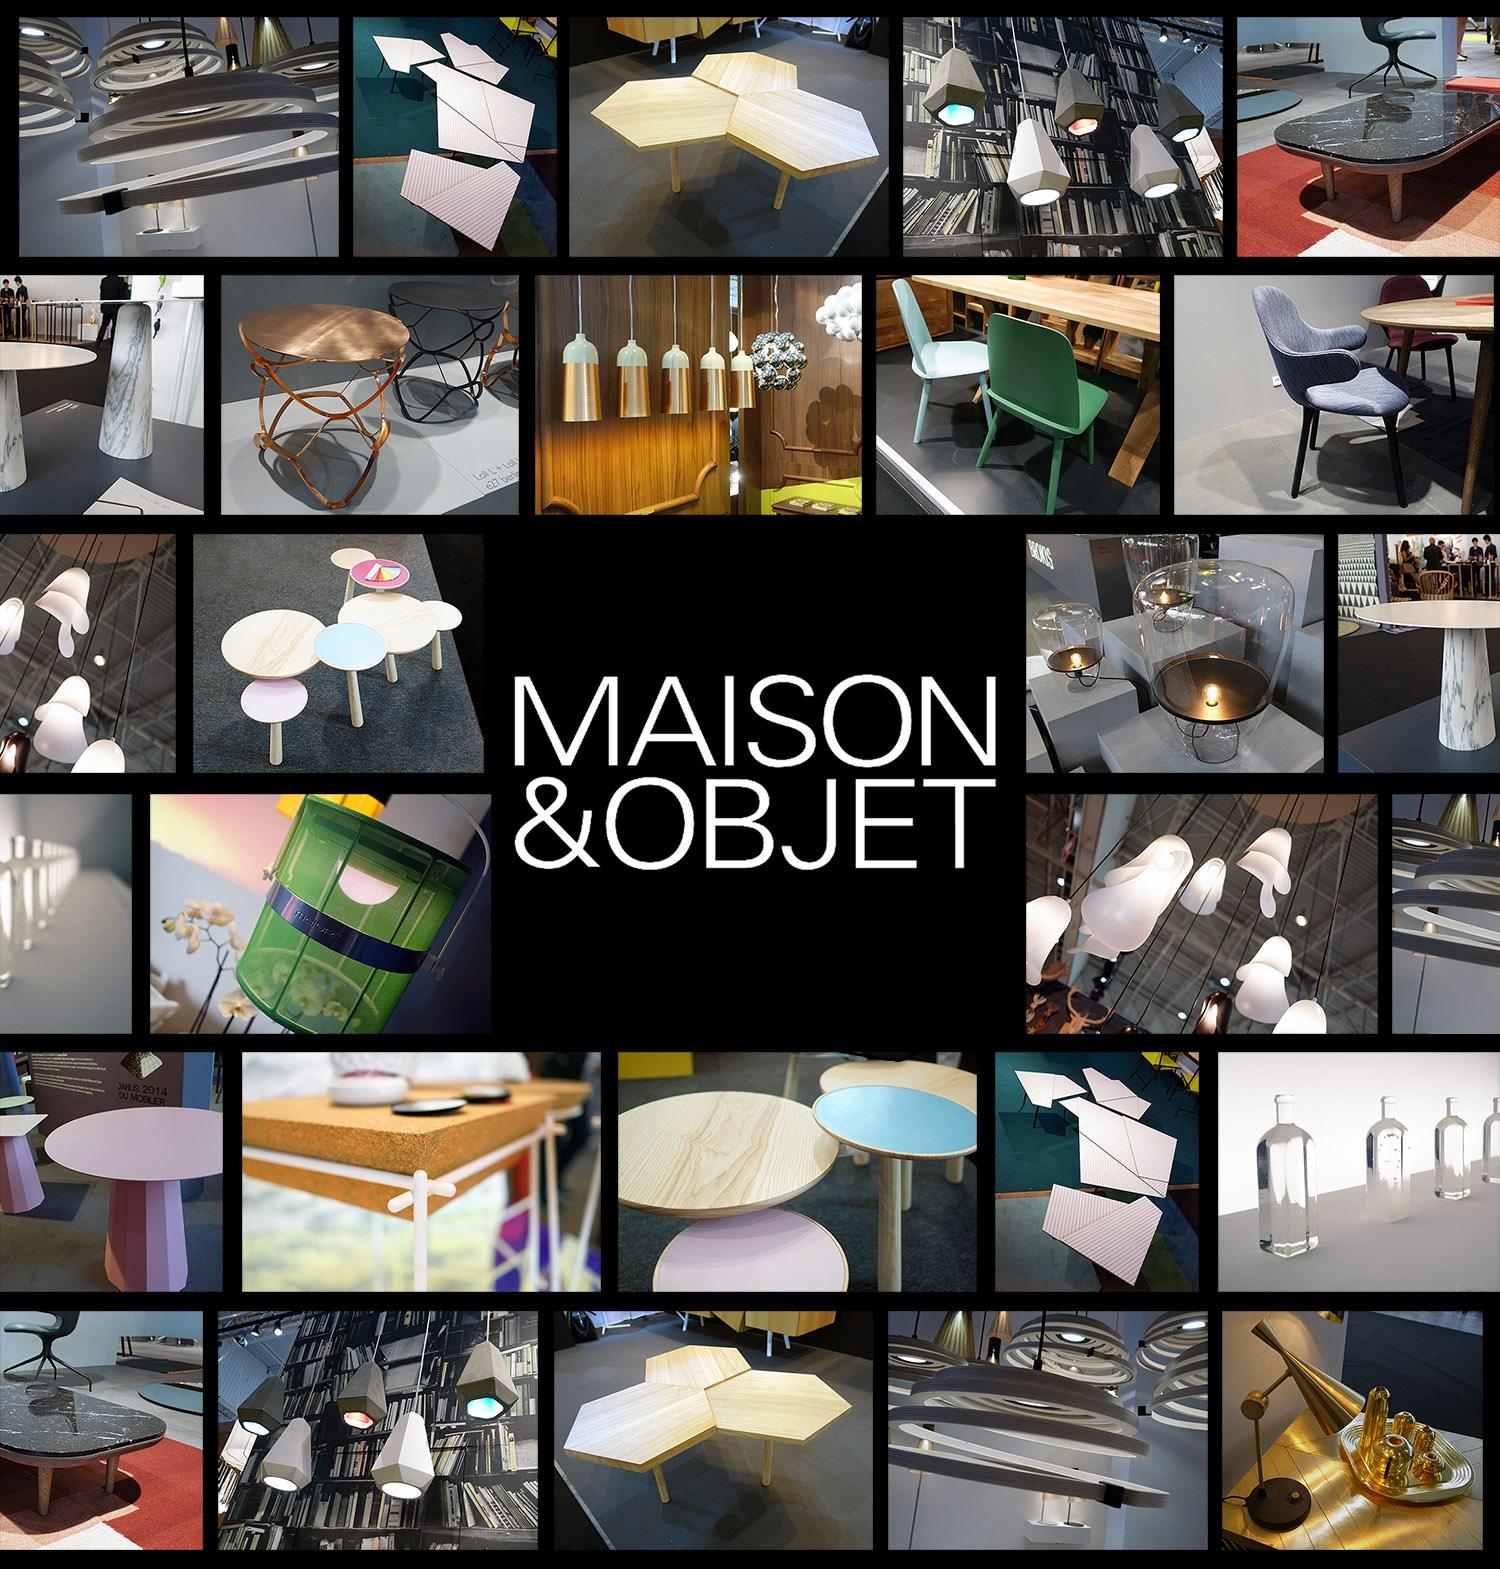 maison objet 2015 art and decoration mirror 39 s exhibitors paris design agenda. Black Bedroom Furniture Sets. Home Design Ideas